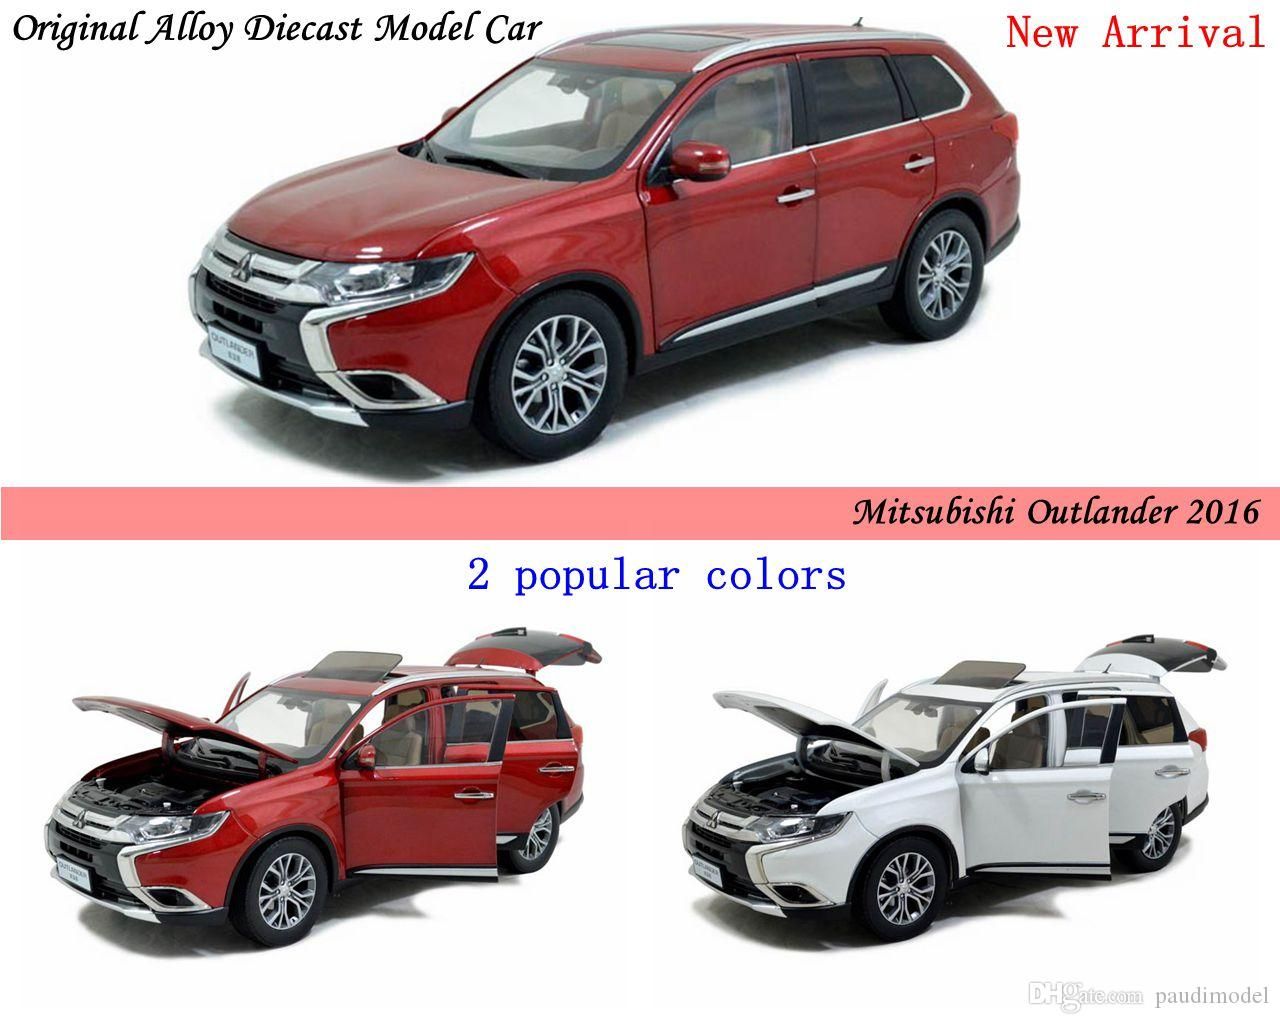 https://www.dhresource.com/0x0s/f2-albu-g5-M01-E5-99-rBVaJFlDs5eAMZ8sAAJDuwrT51s668.jpg/brand-new-diecast-modell-car-for-mitsubishi.jpg